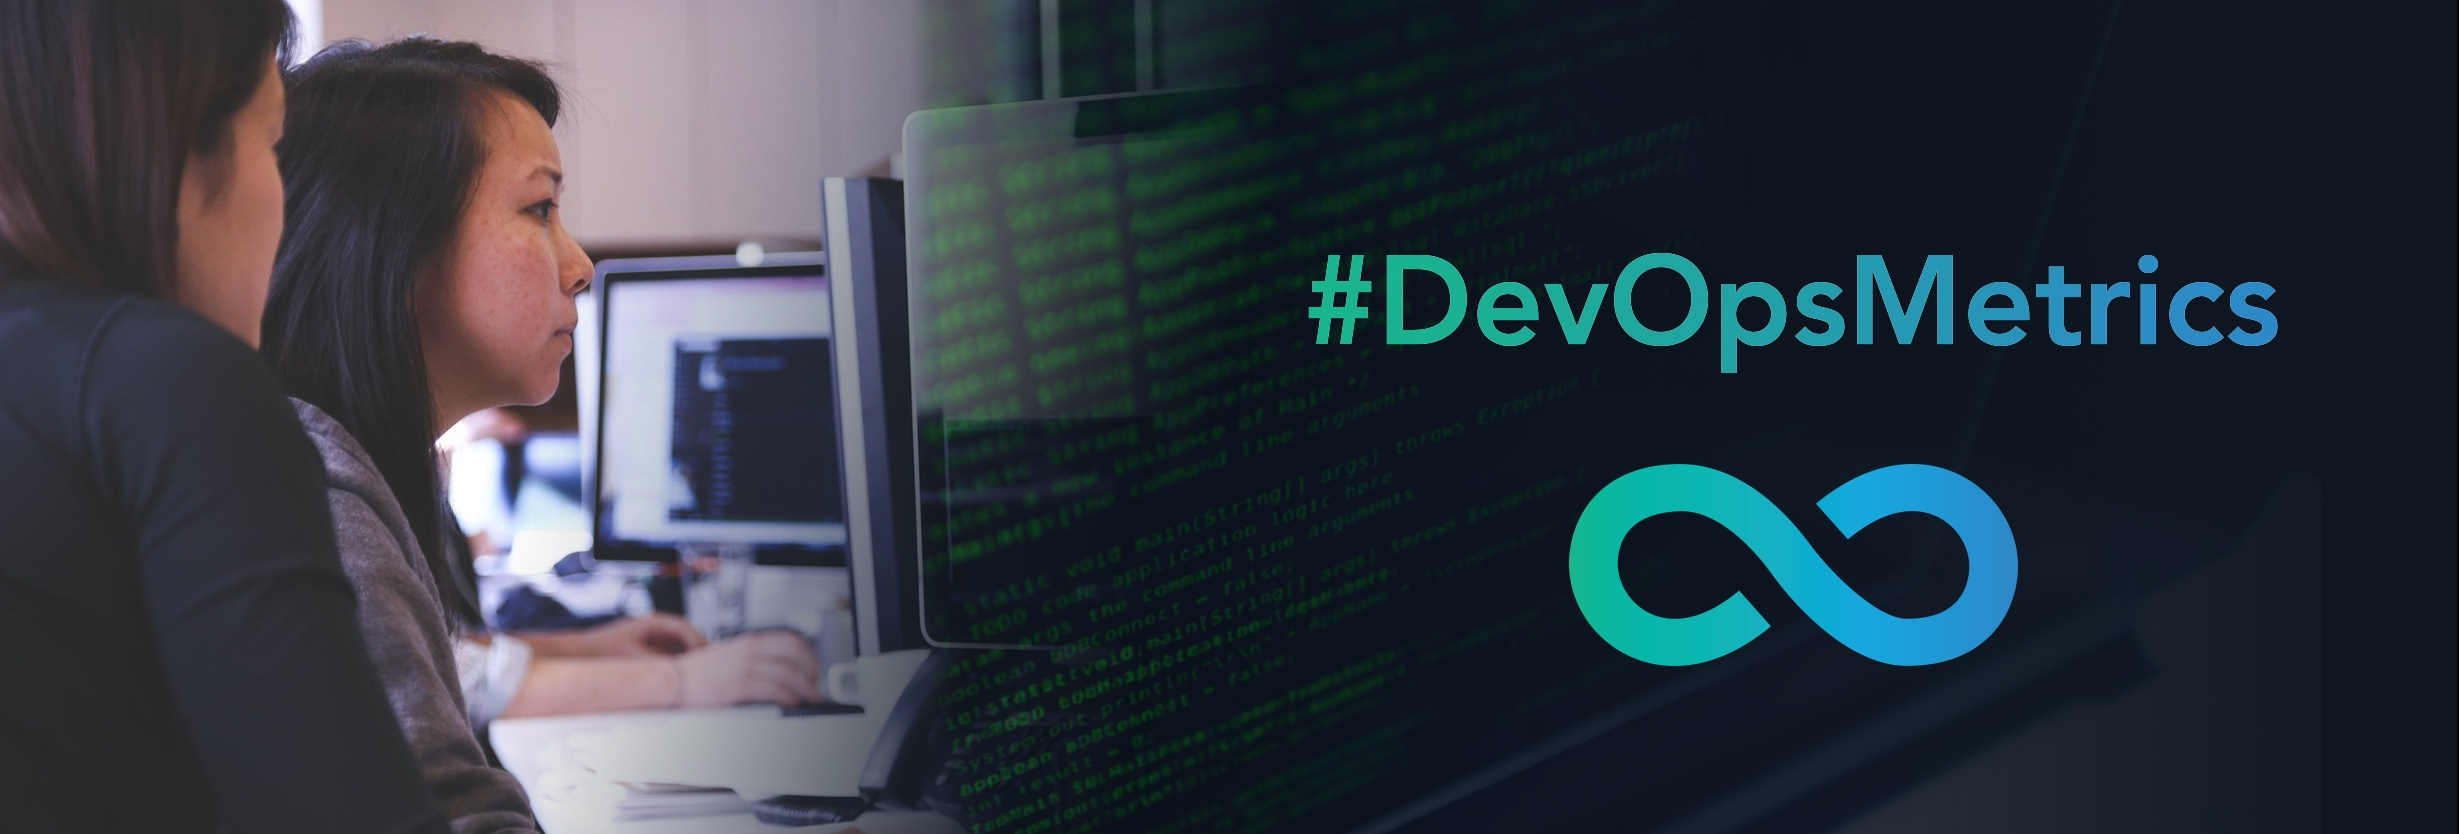 [Infographic] Doing DevOps? Do You Have The DevOps Metrics That Matter Most?